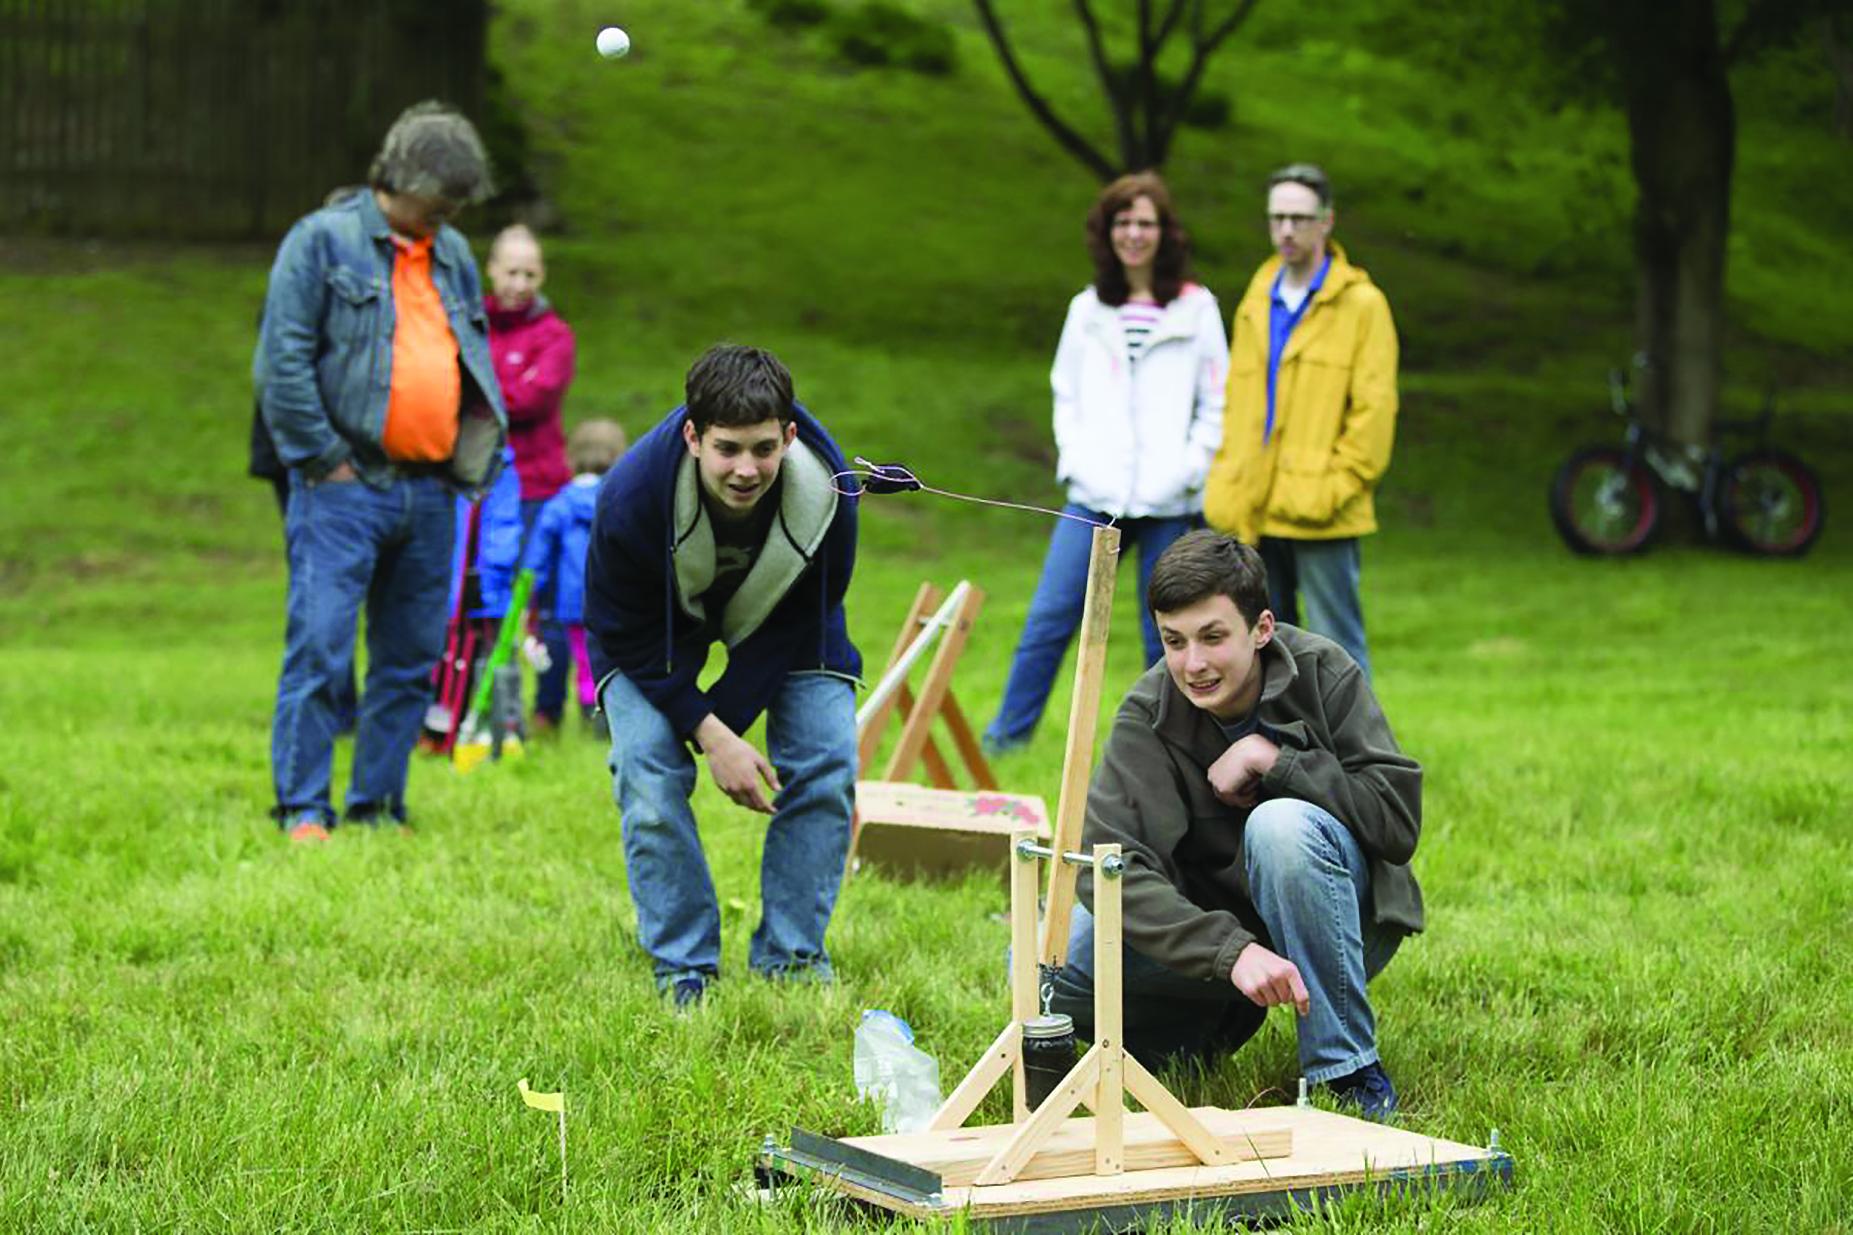 Launch It! Trebuchet Contest